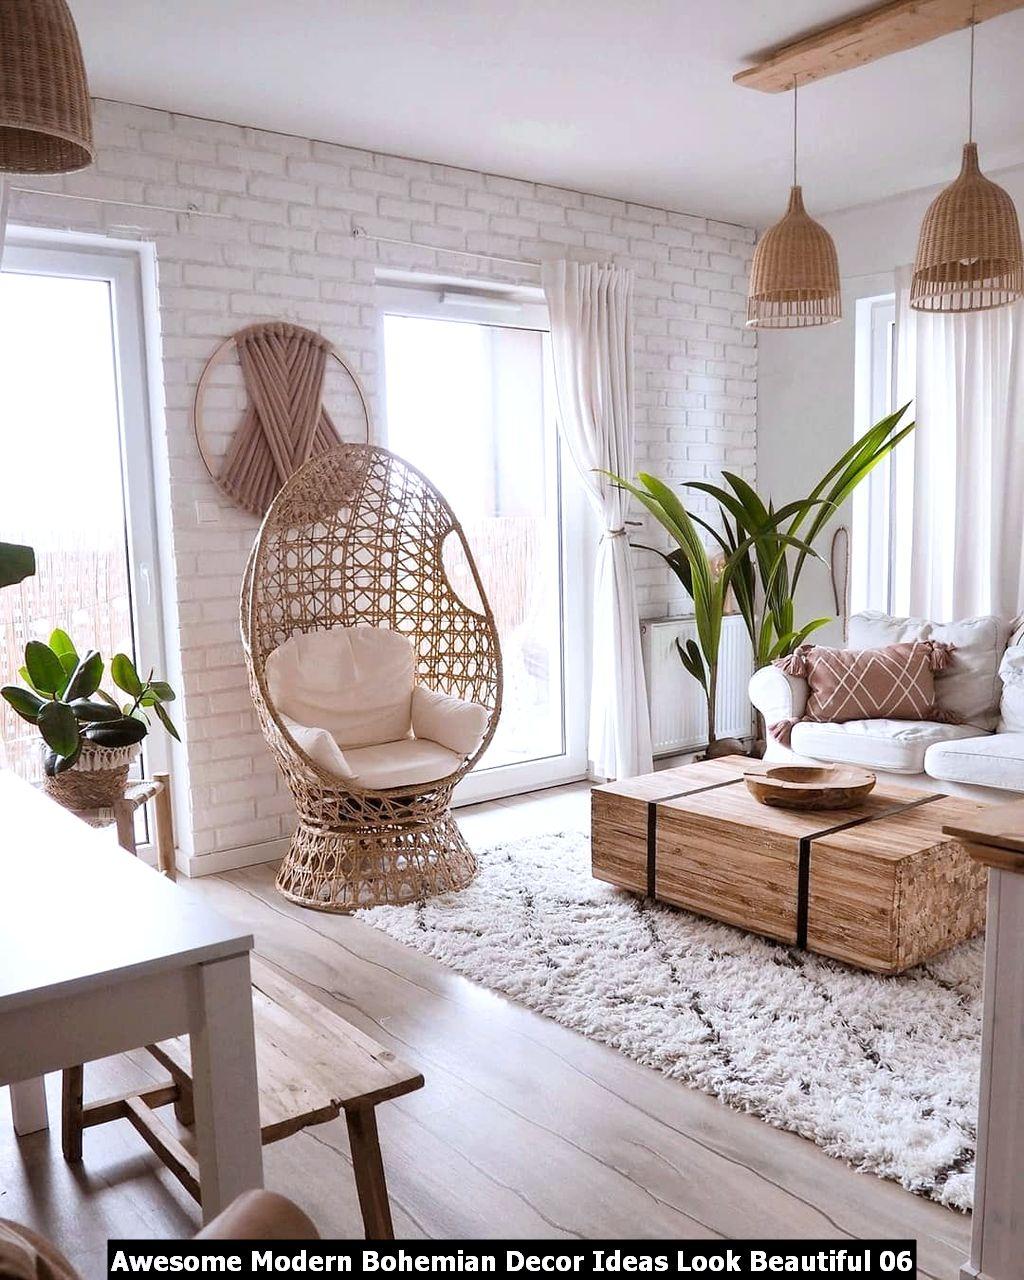 Awesome Modern Bohemian Decor Ideas Look Beautiful 06